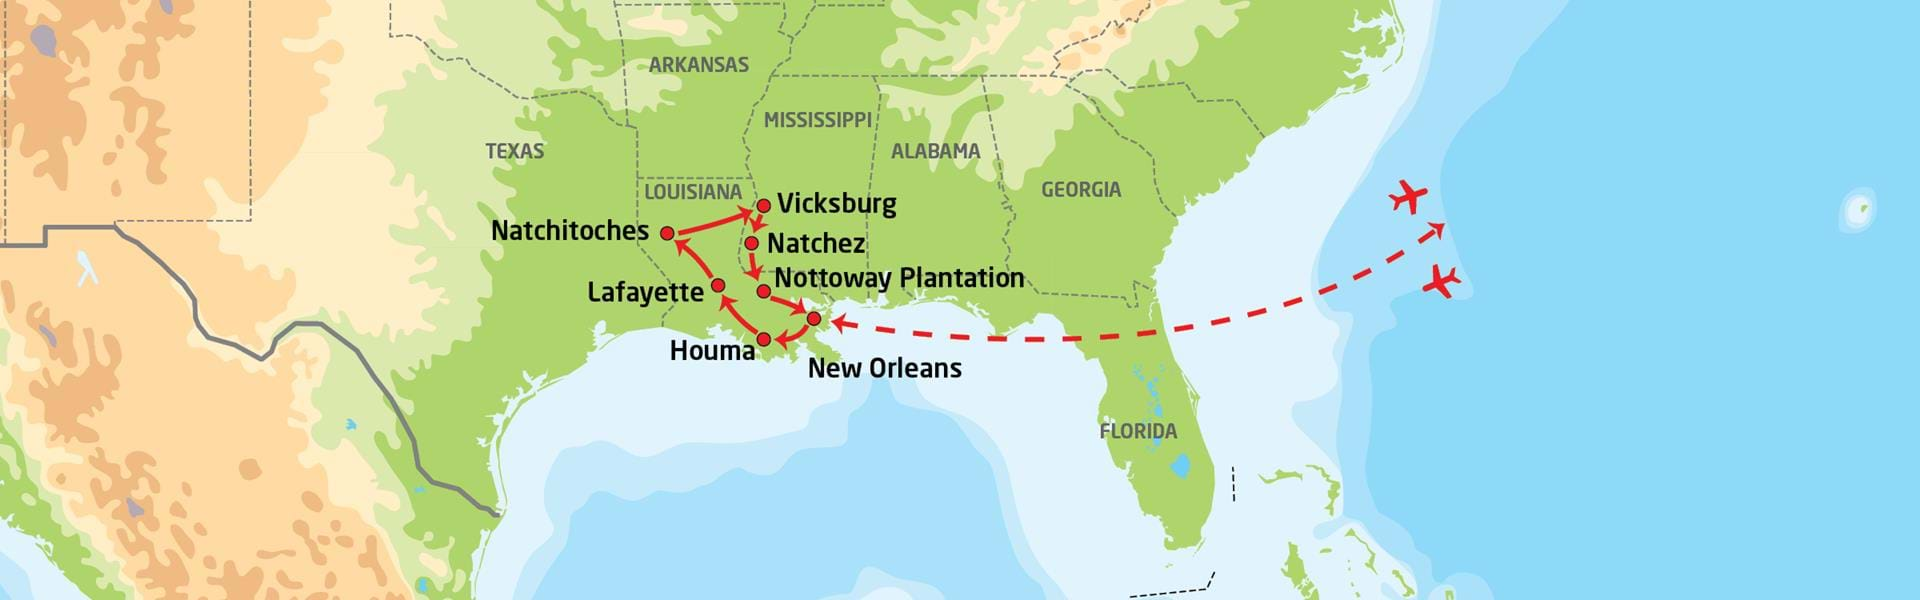 Sydstaterne Helt Autentisk Kor Selv Ferie Med Benns